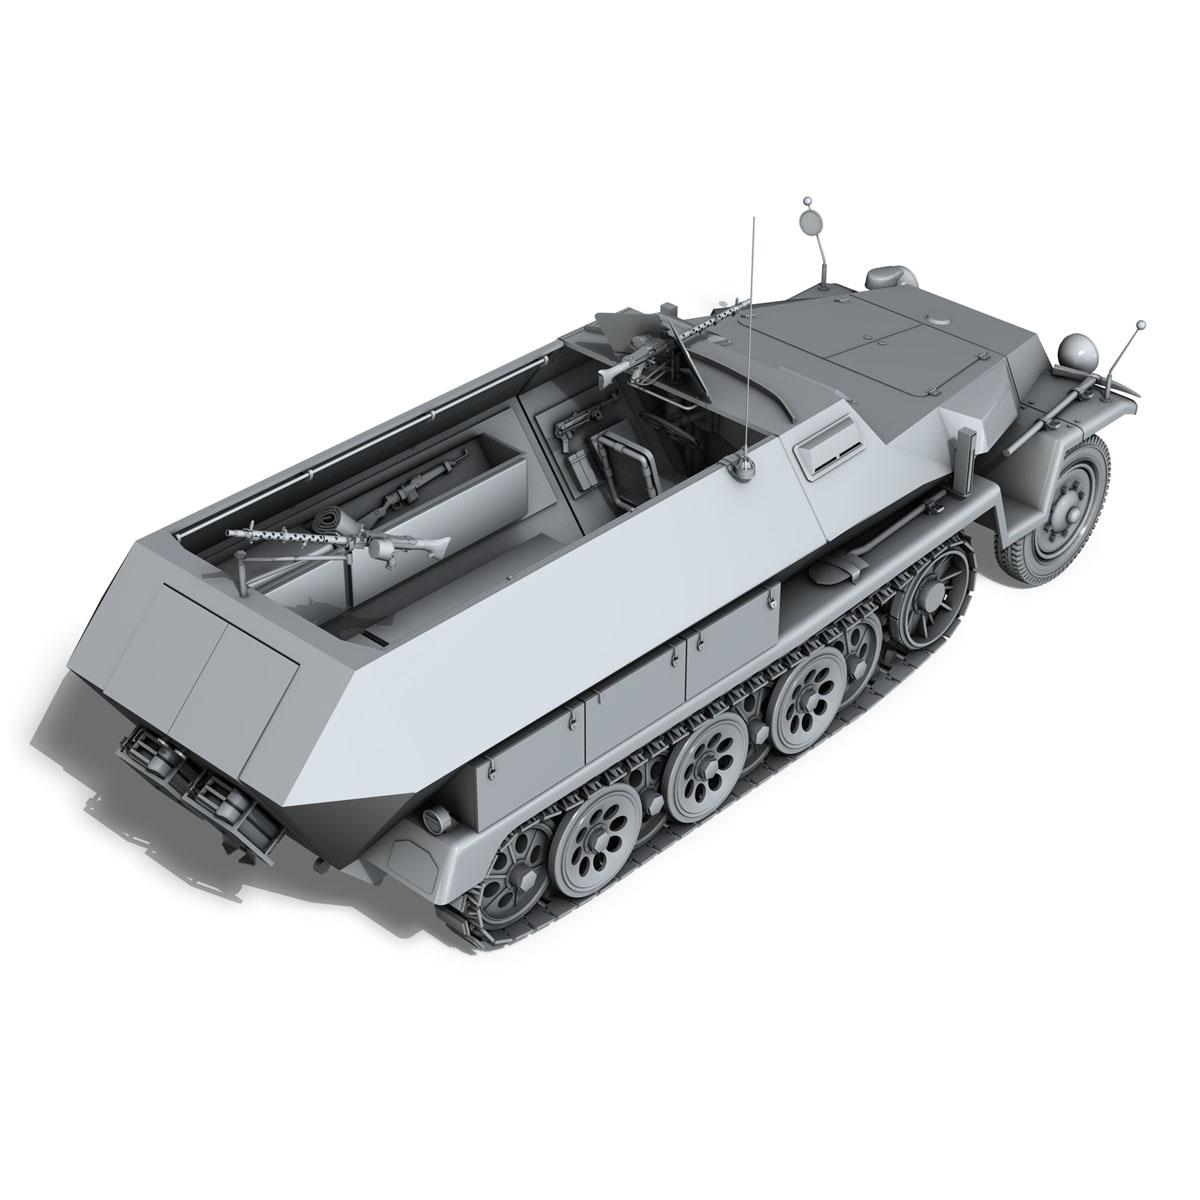 sd.kfz 251/1 ausf.c – hanomag halftruck 3d model 3ds fbx c4d lwo obj 201167